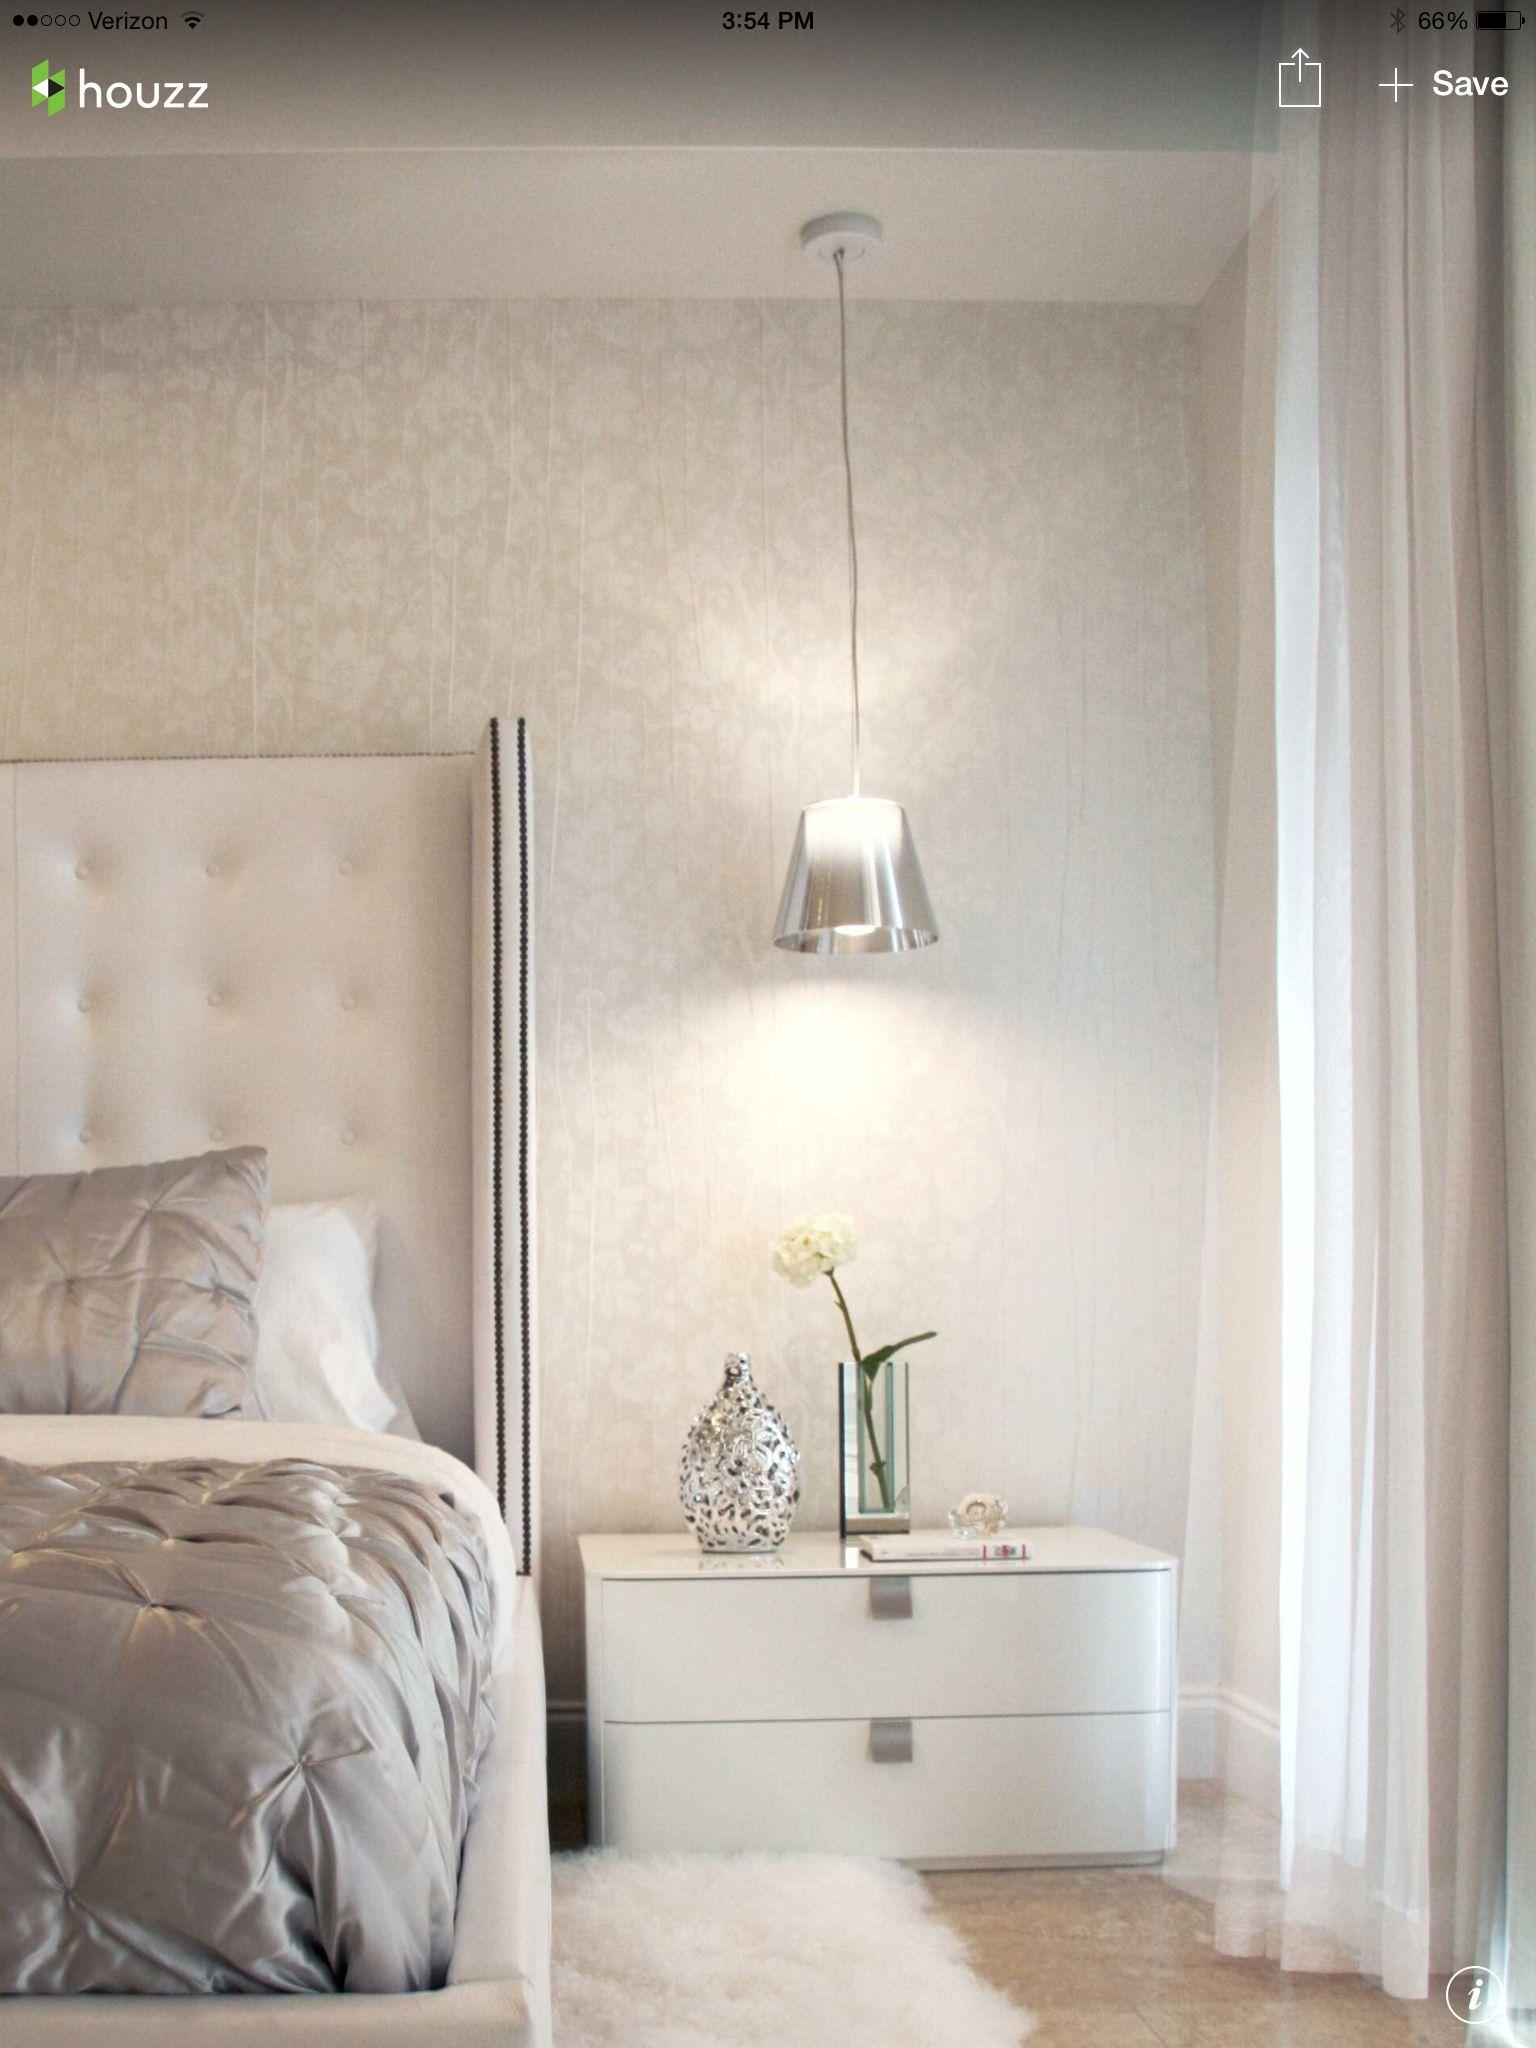 Ktribe S1 pendant lights for master bedroom